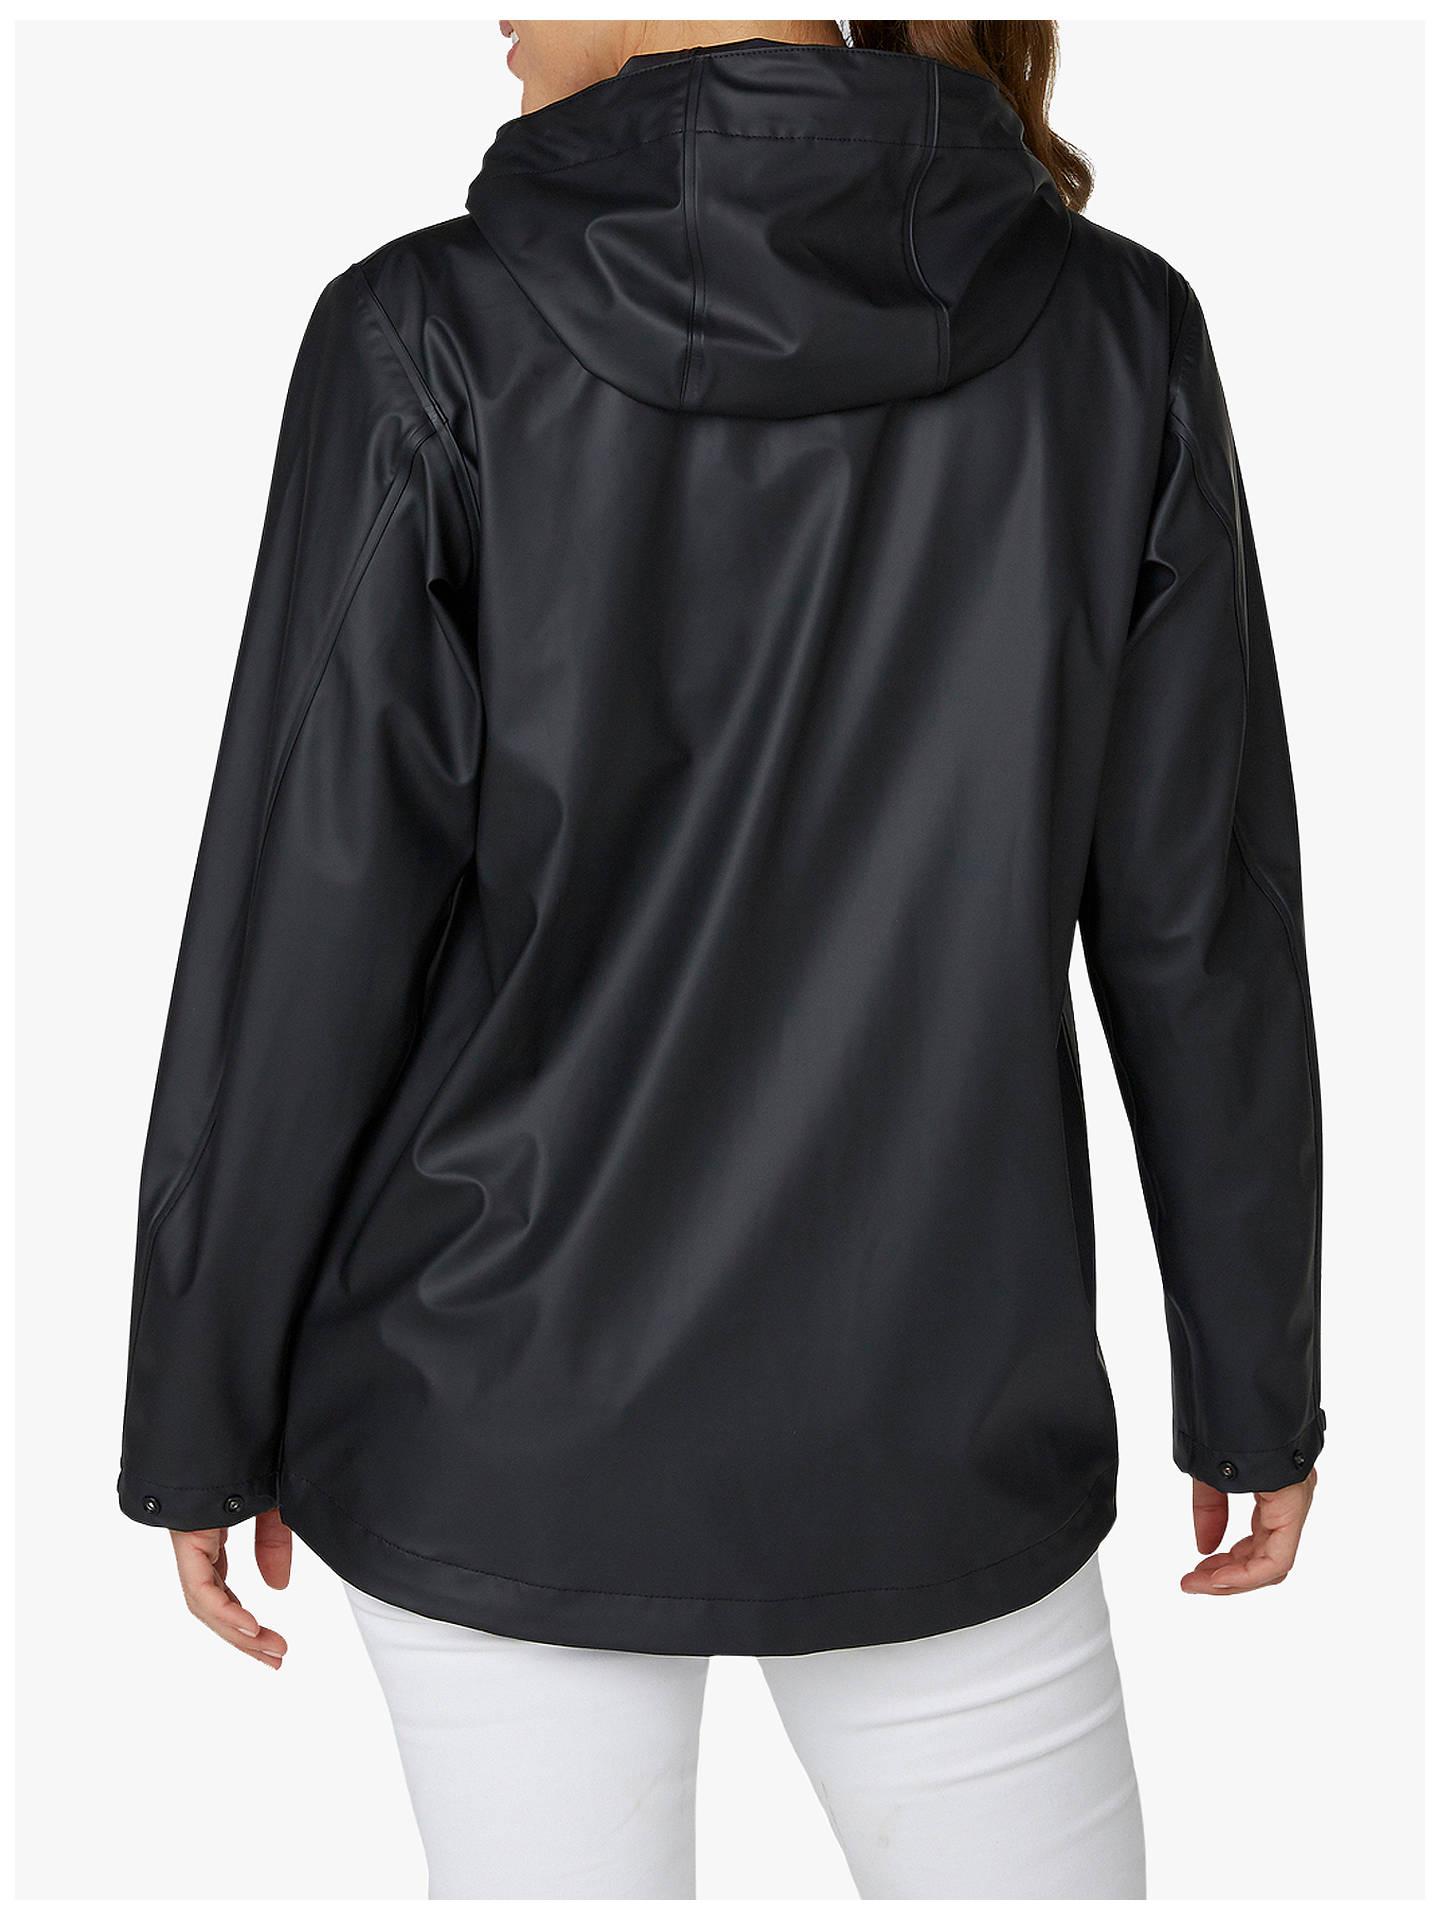 4afe371b69 ... Buy Helly Hansen Moss Women's Windproof Jacket, Black, XL Online at  johnlewis. ...